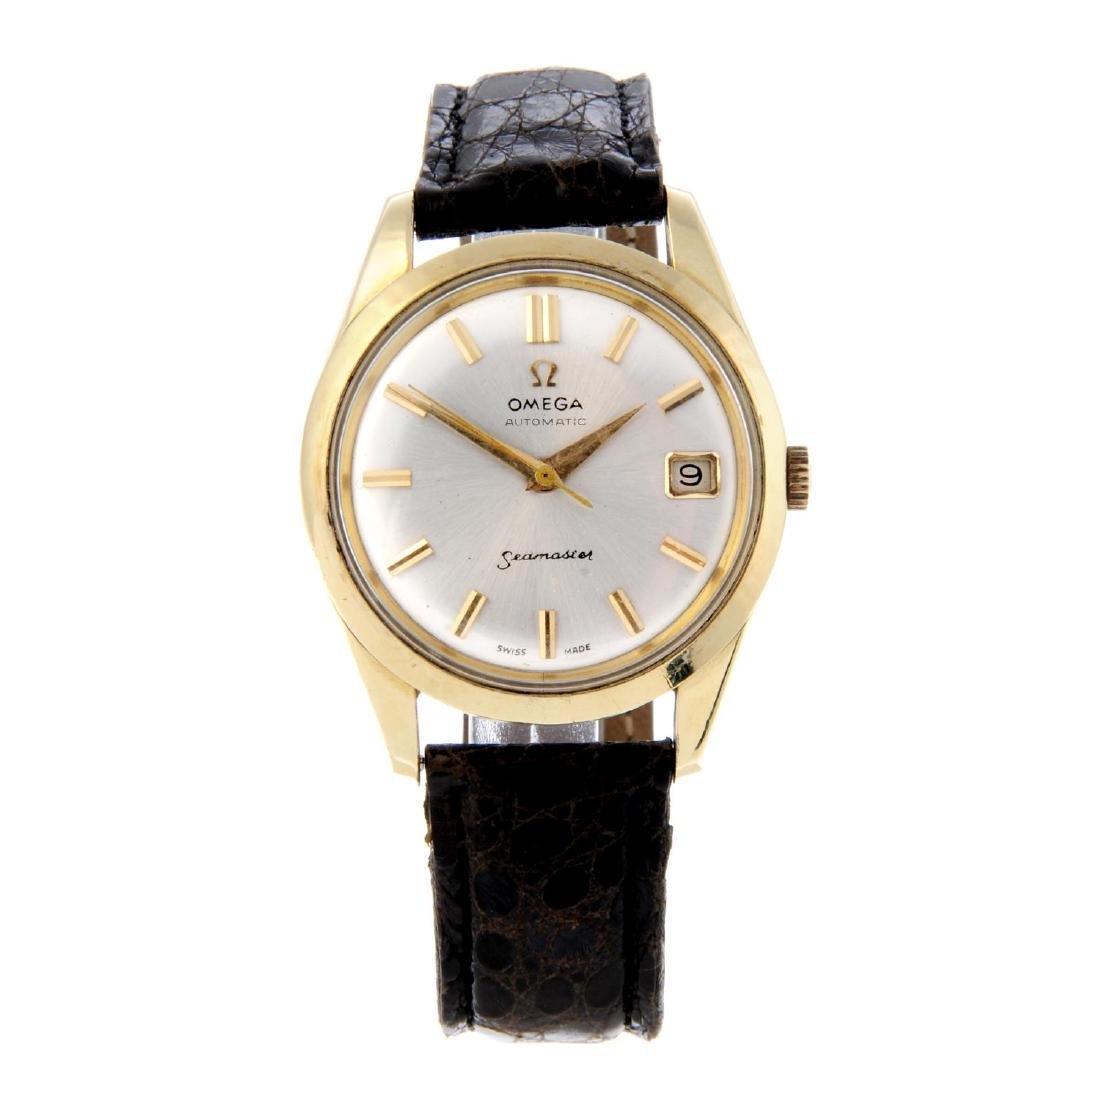 OMEGA - a gentleman's Seamaster wrist watch. Gold